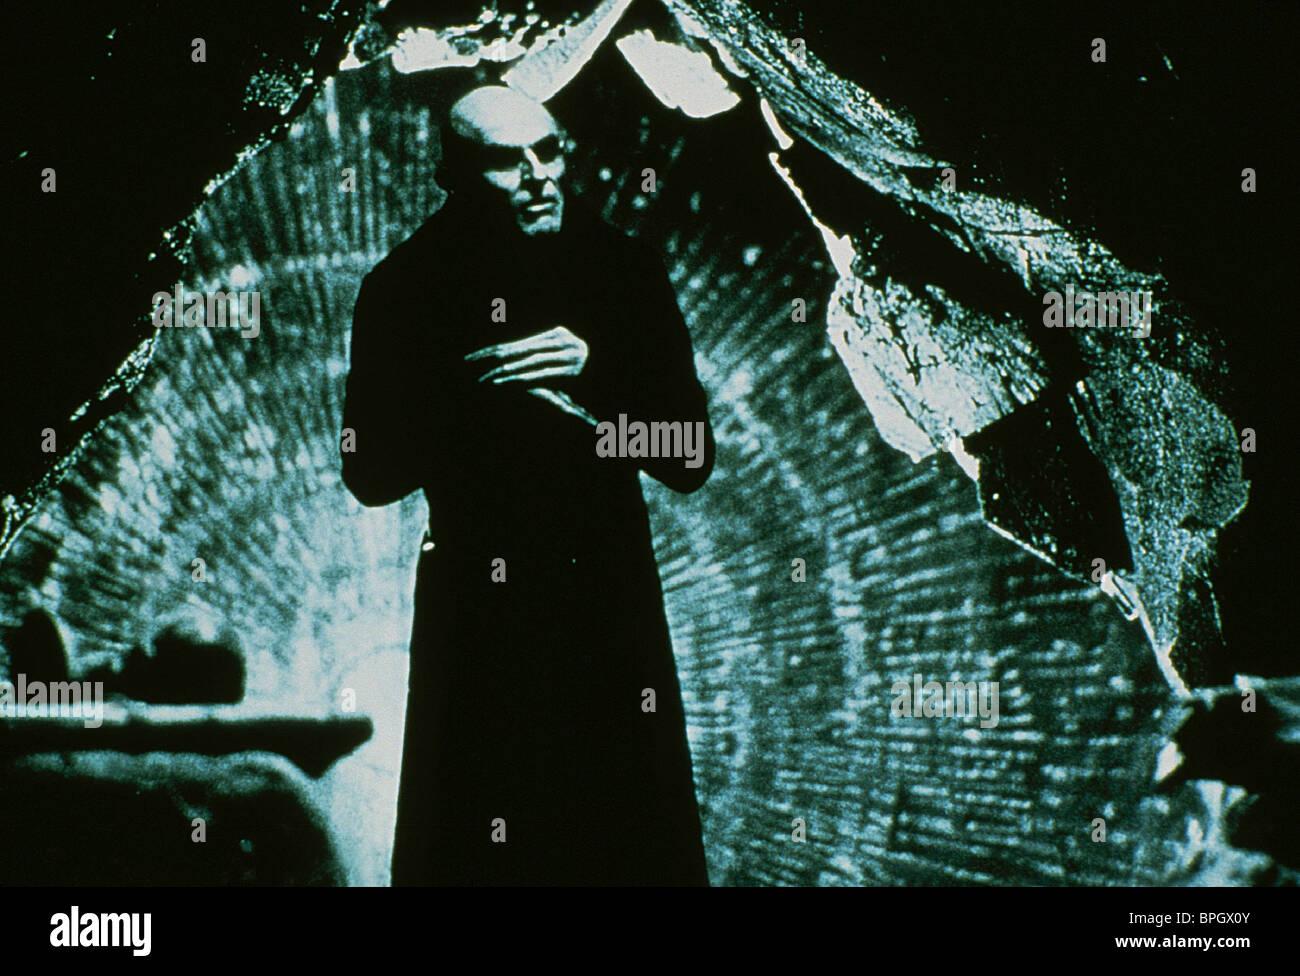 WILLEM DAFOE SHADOW OF THE VAMPIRE (2000) Photo Stock